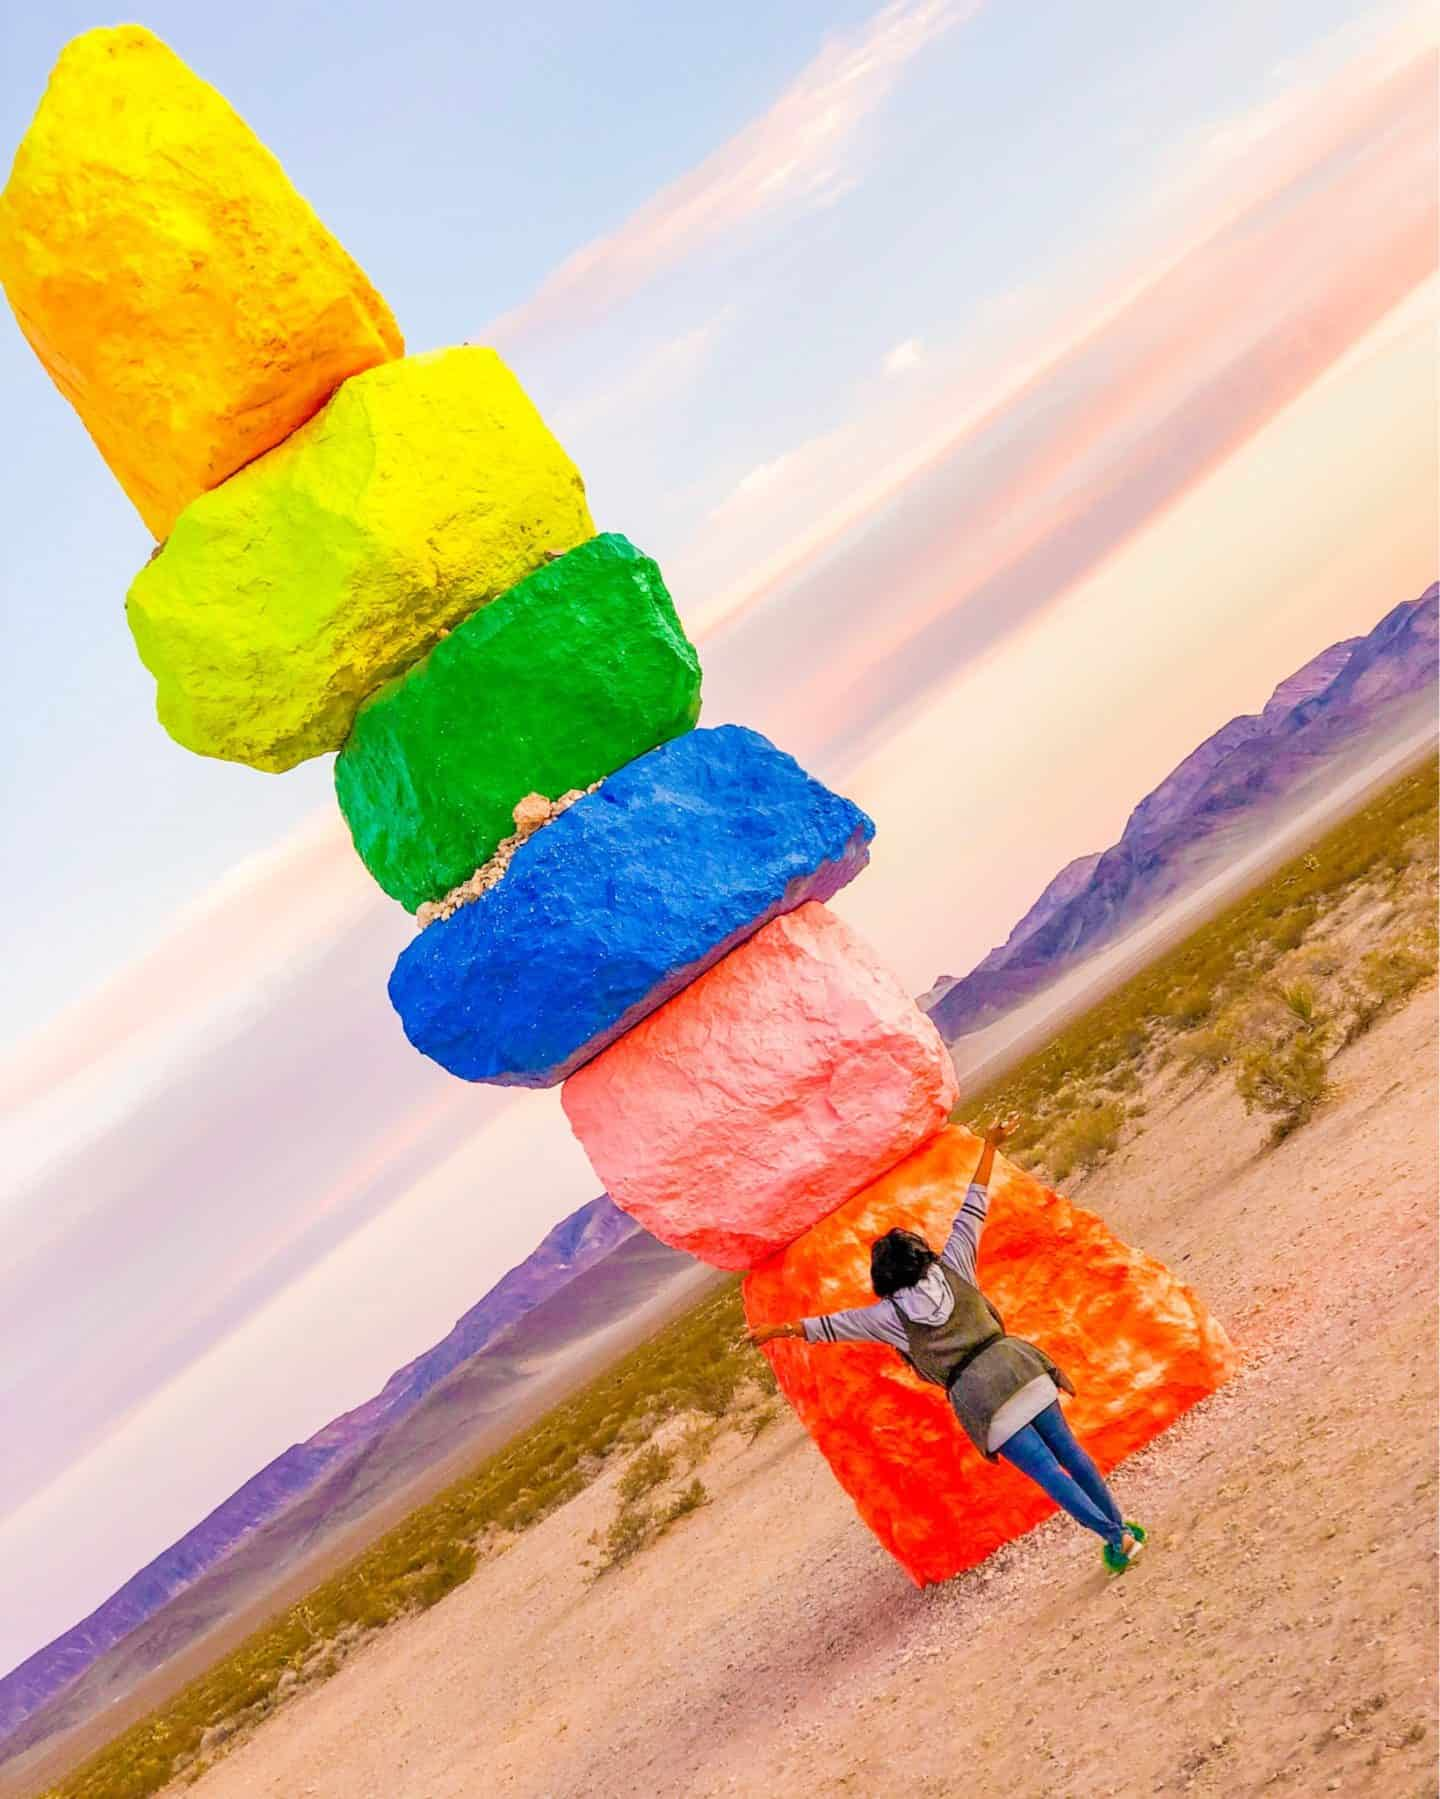 Shaunda Necole Nevada Museum Of Art Seven Magic Mountains